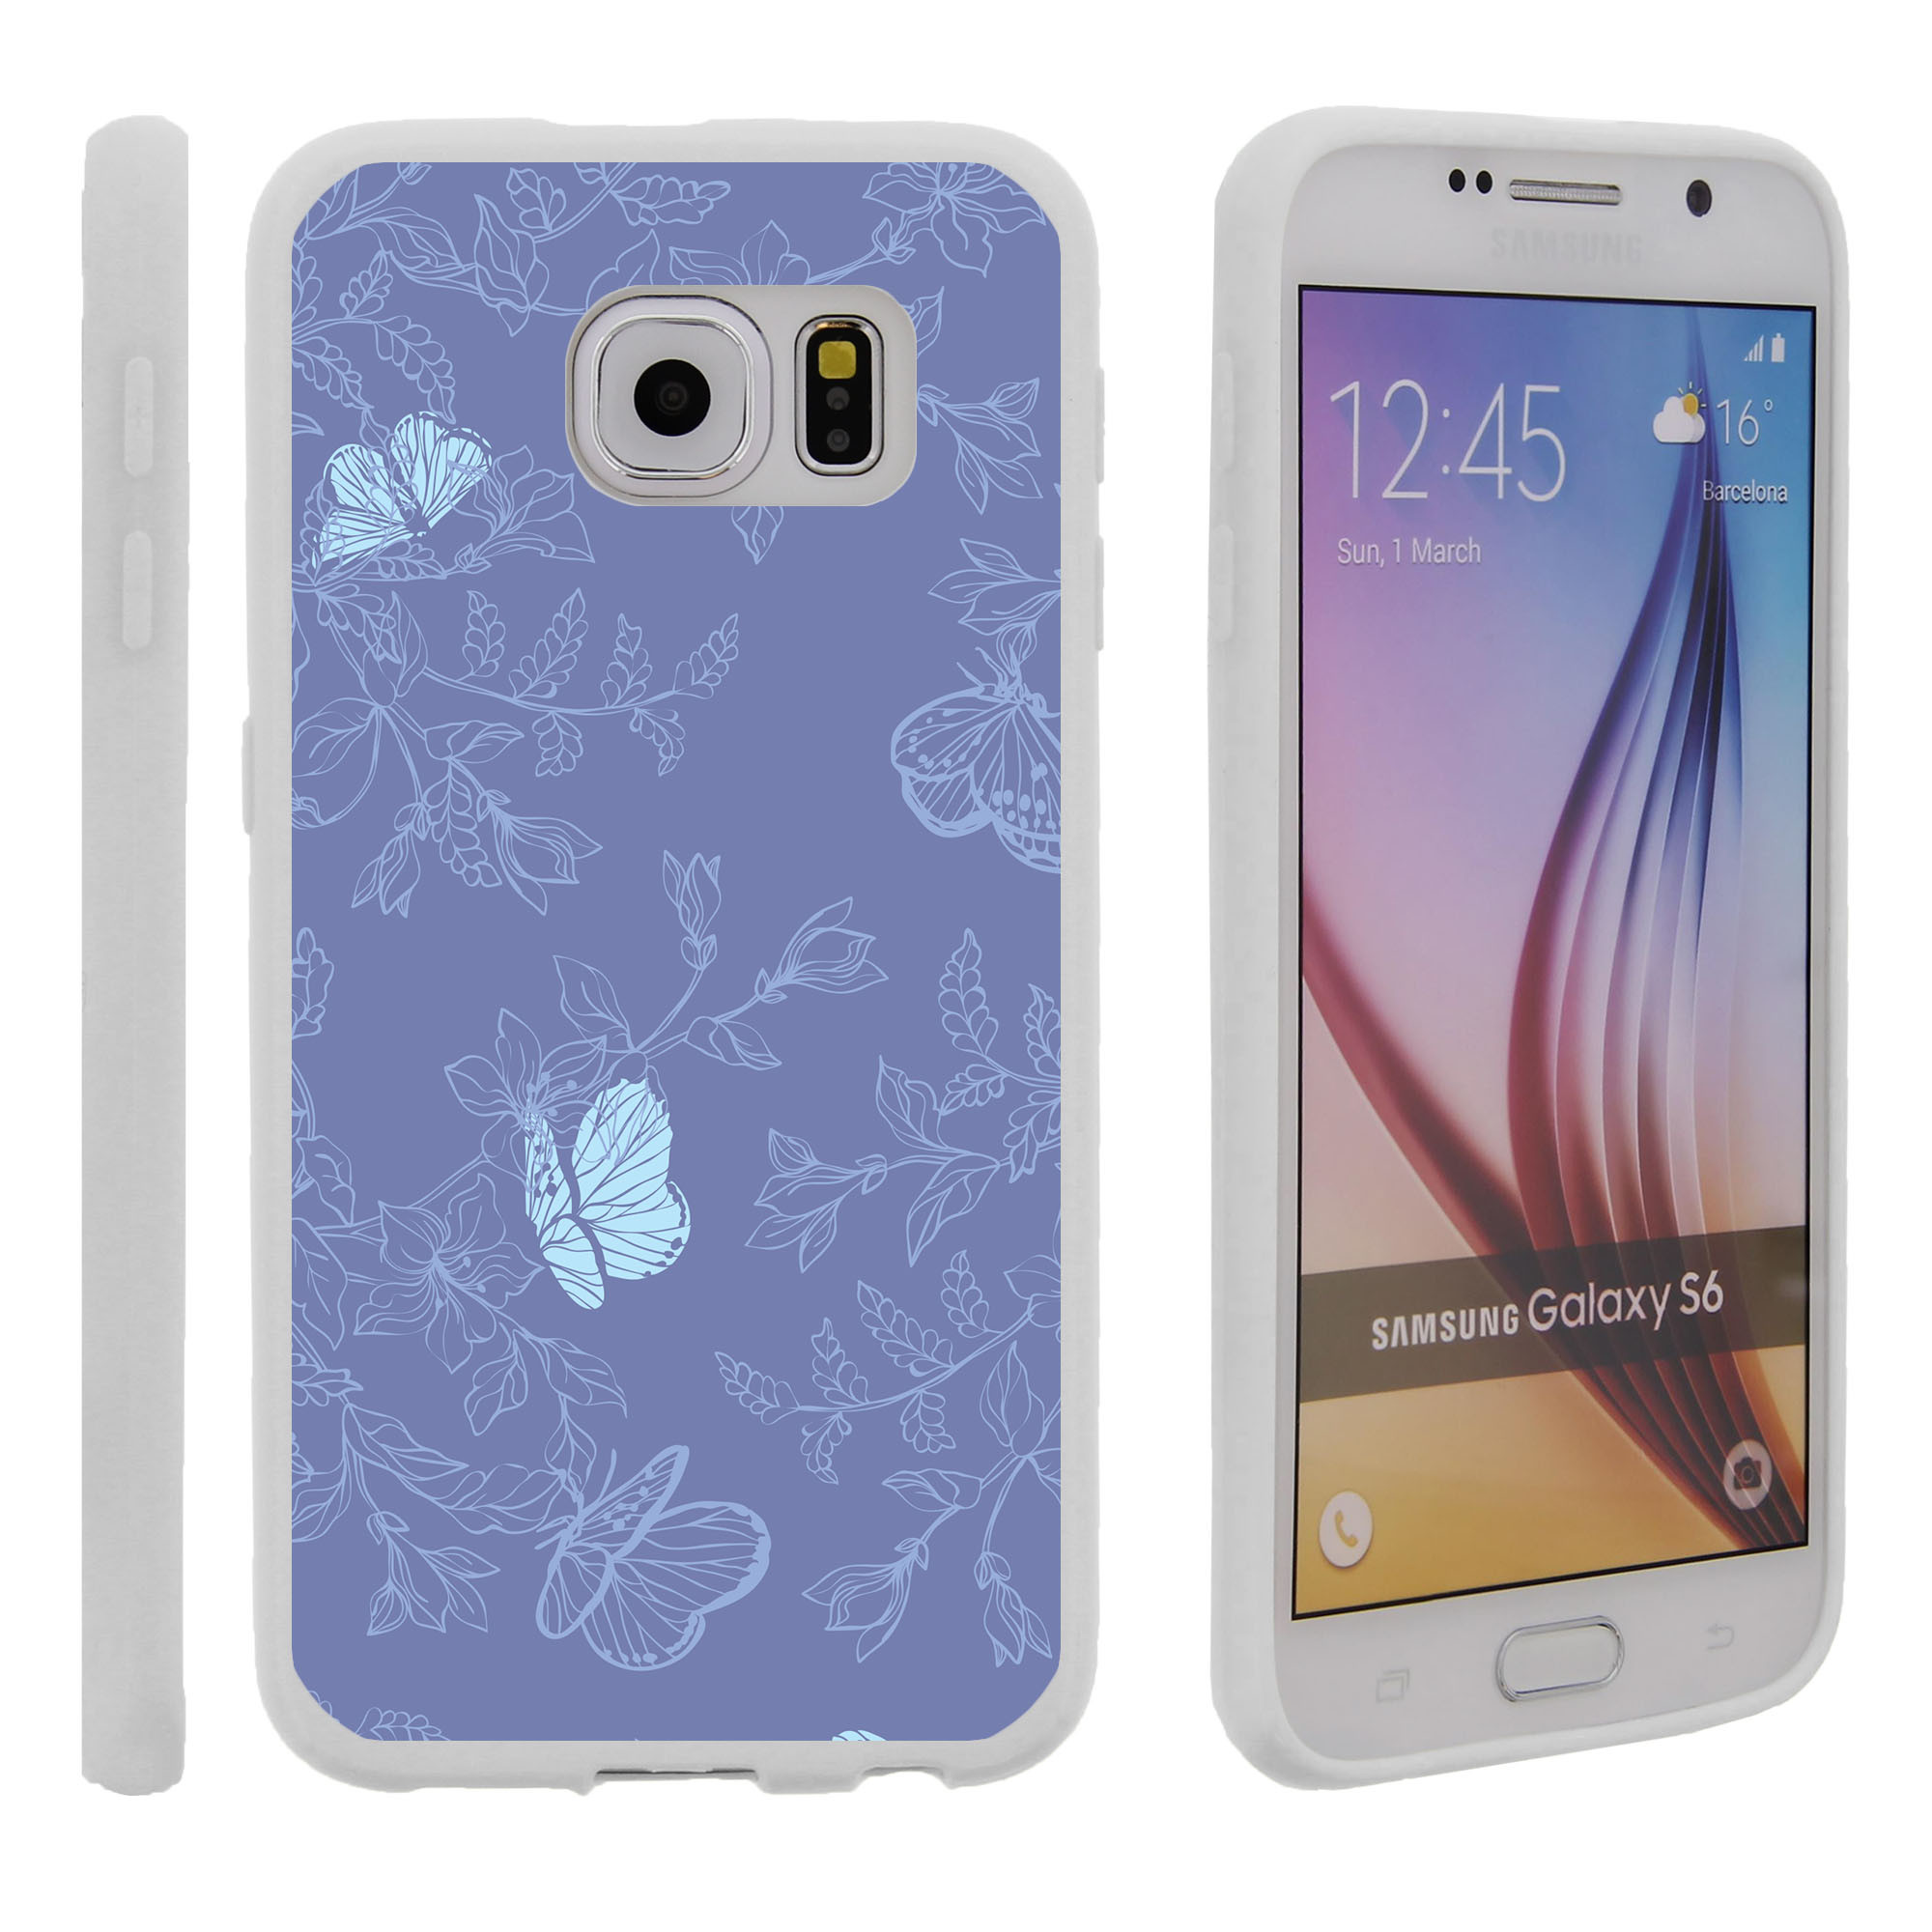 Samsung Galaxy S6 G920, Flexible Case [FLEX FORCE] Slim Durable TPU Sleek Bumper with Unique Designs - Divine Butterfly